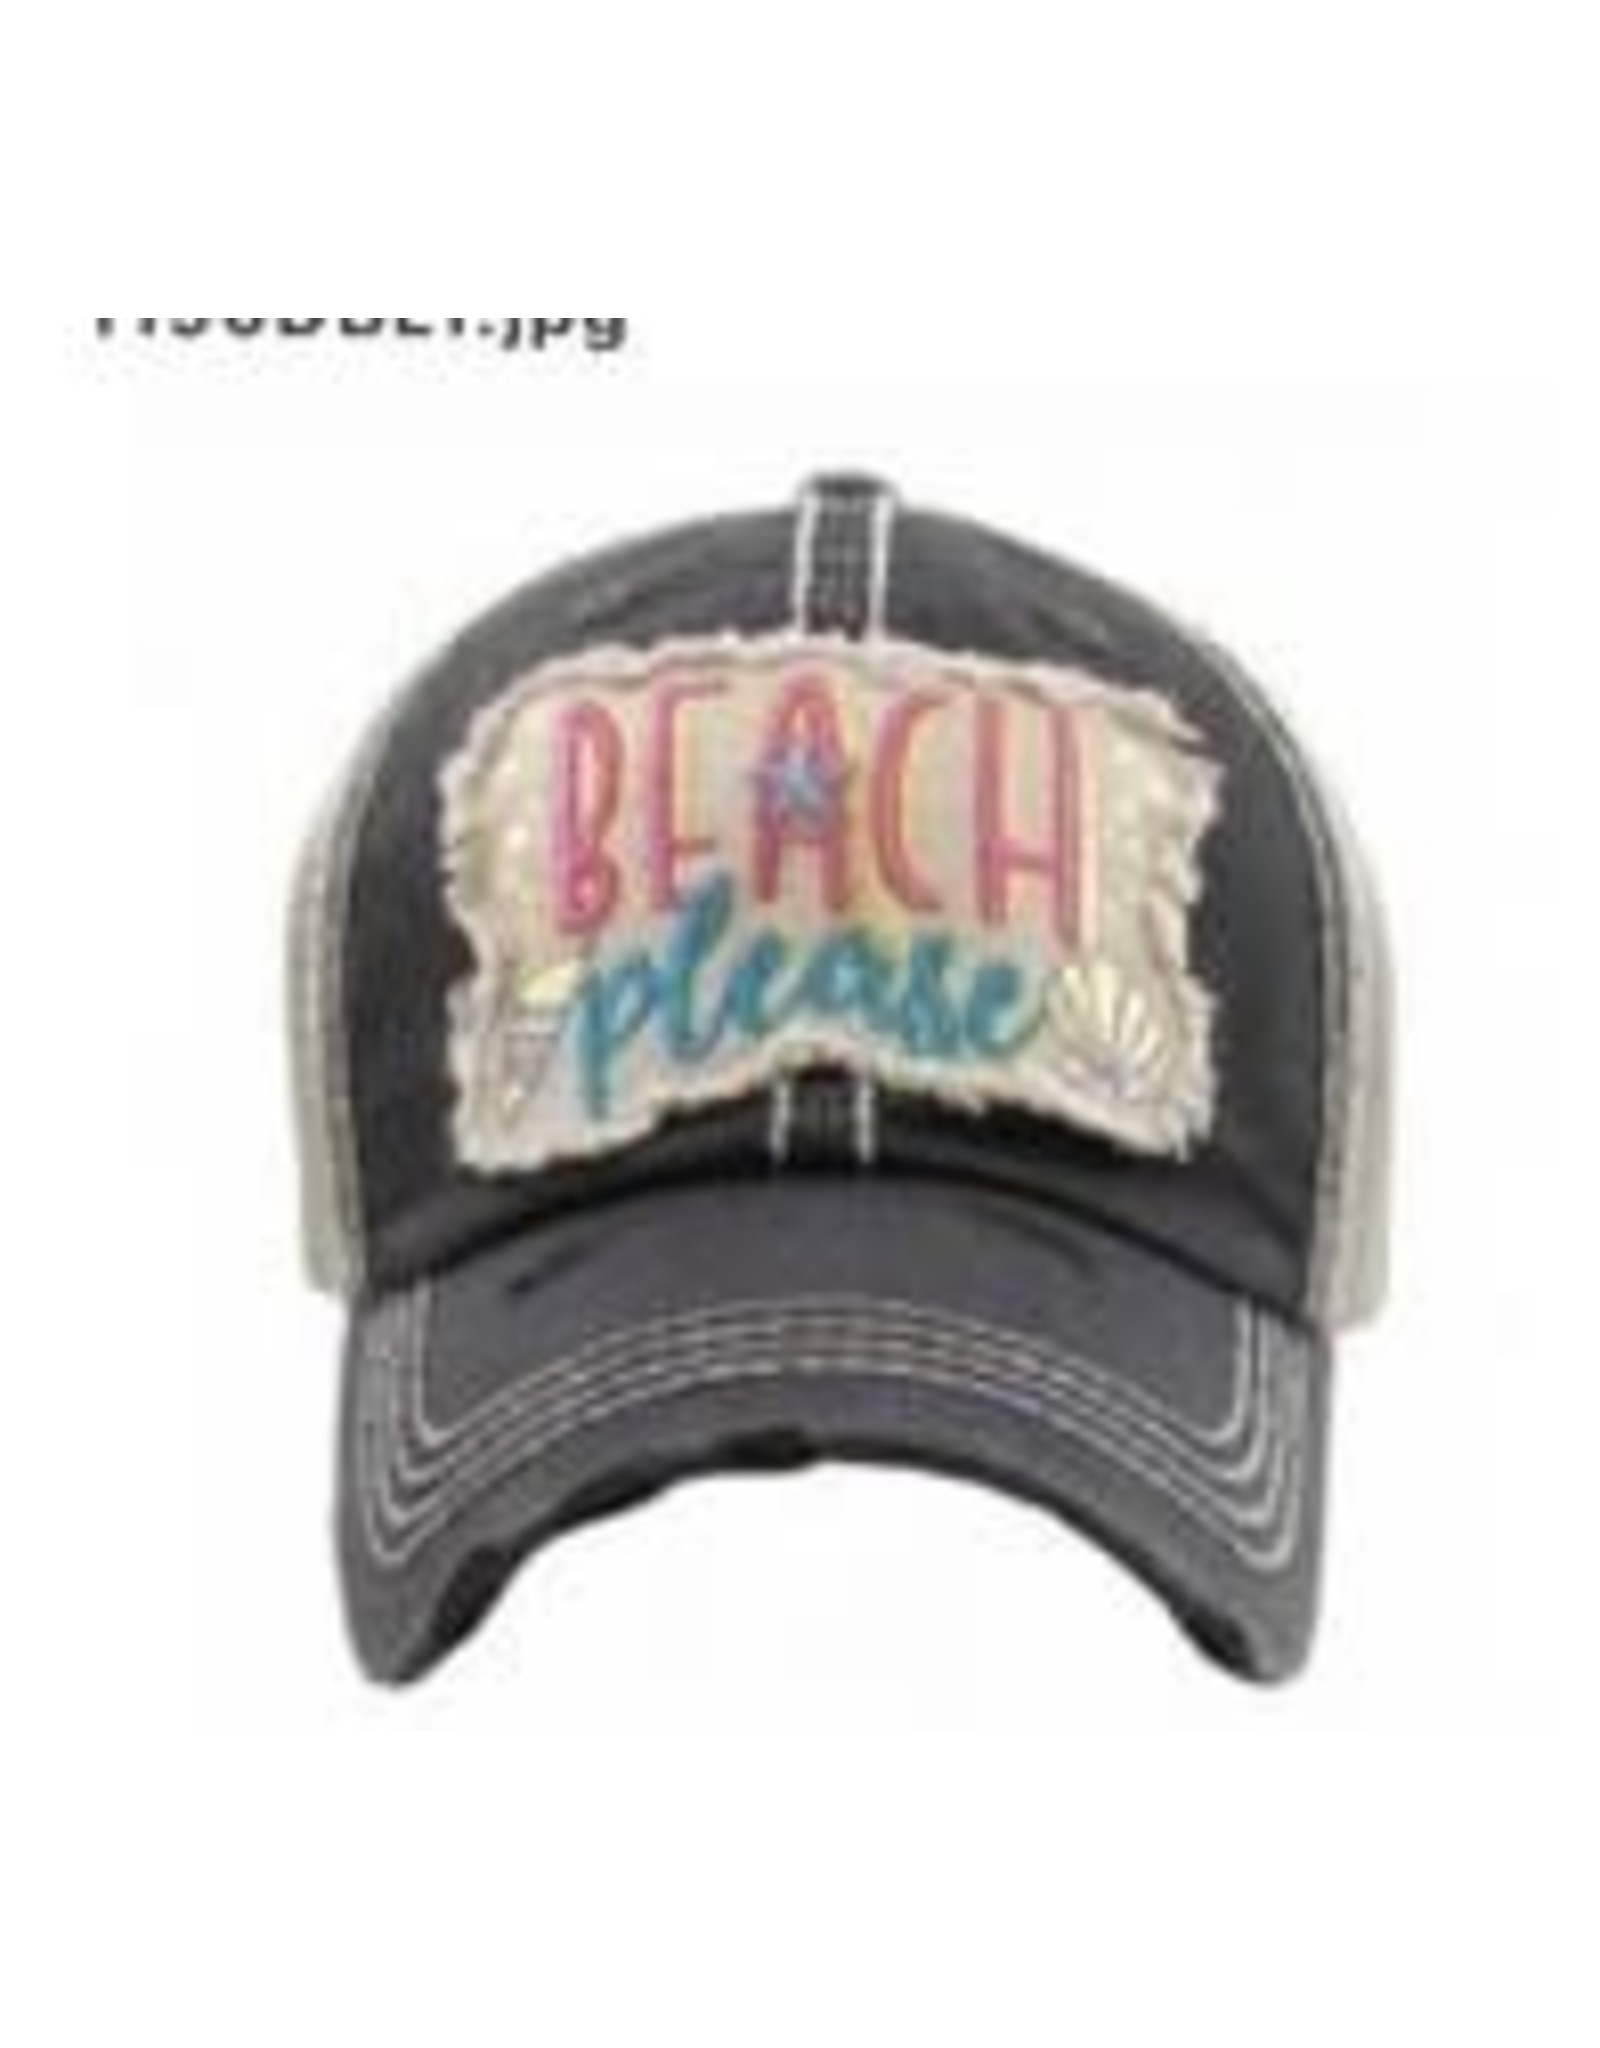 The Chic Bay Chic Hat- Beach Please Black